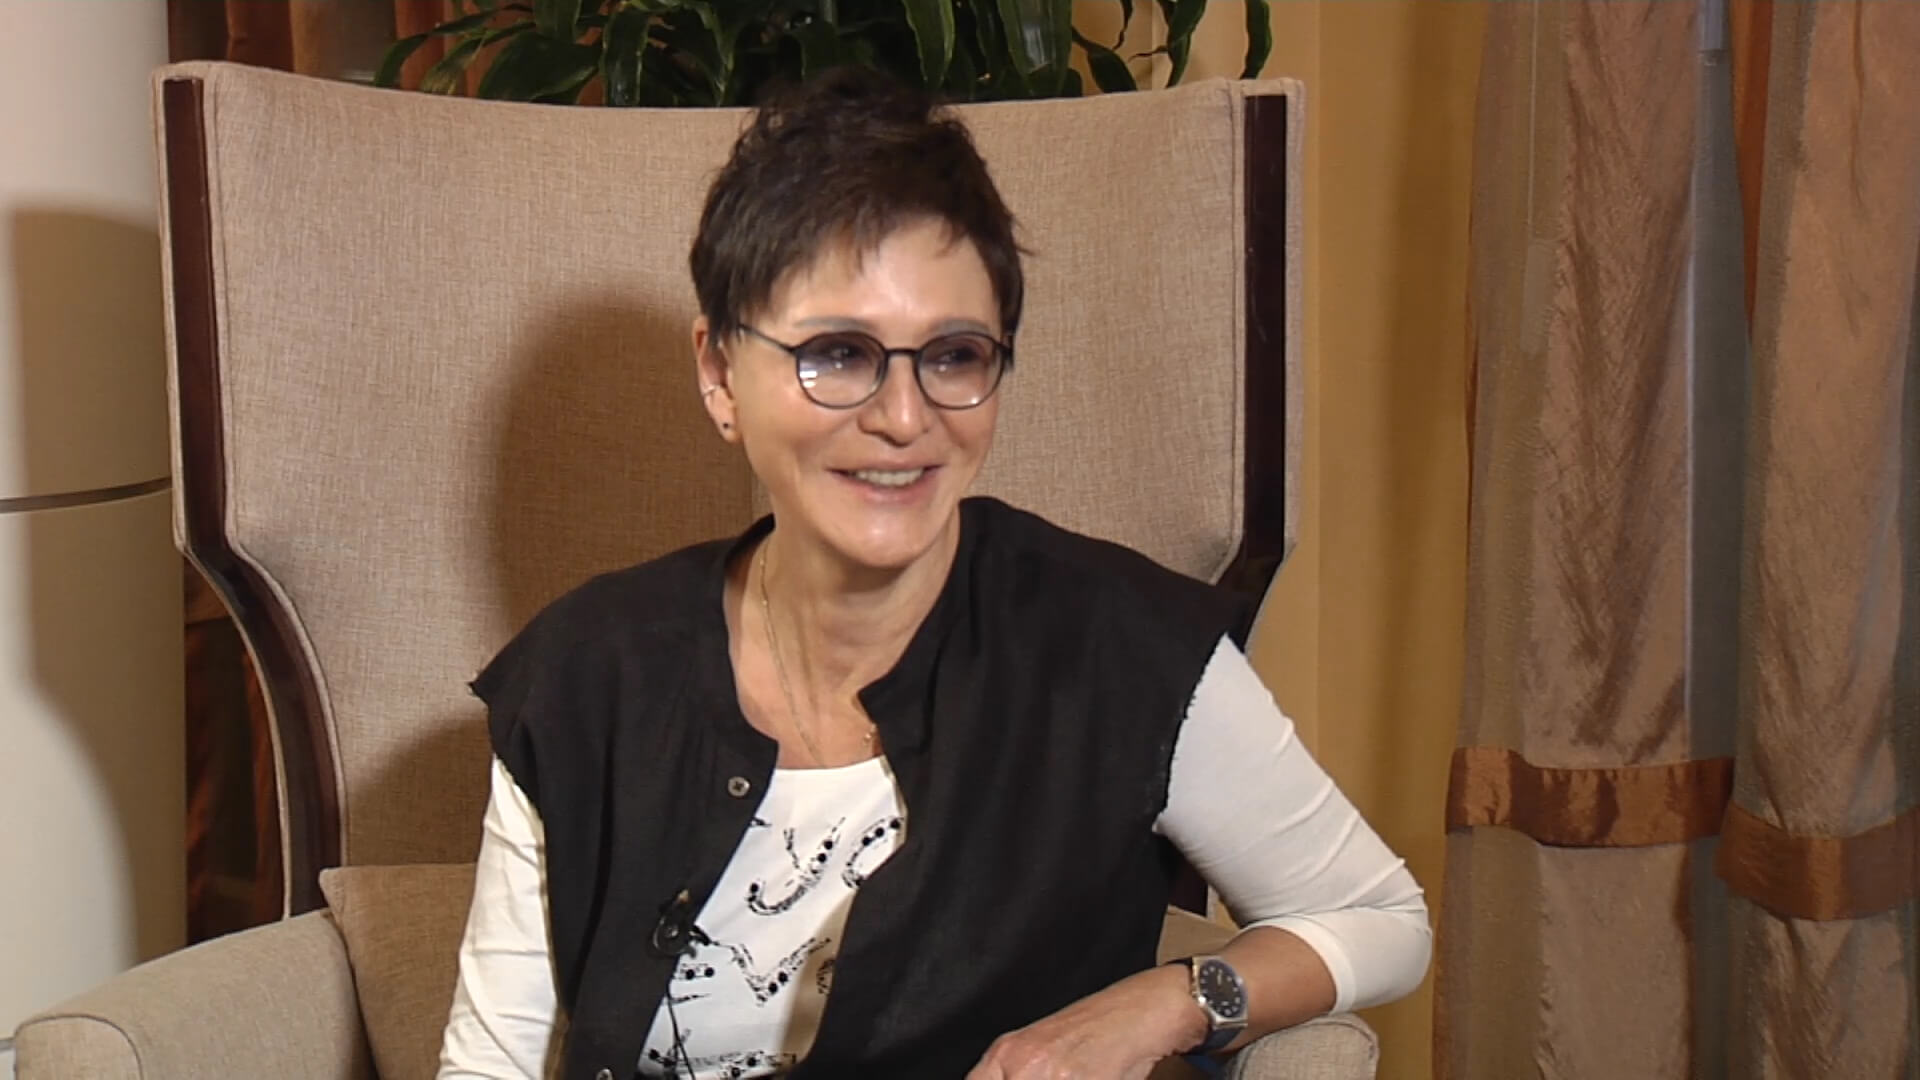 Журналист Ирина Хакамада: легкой жизни не будет